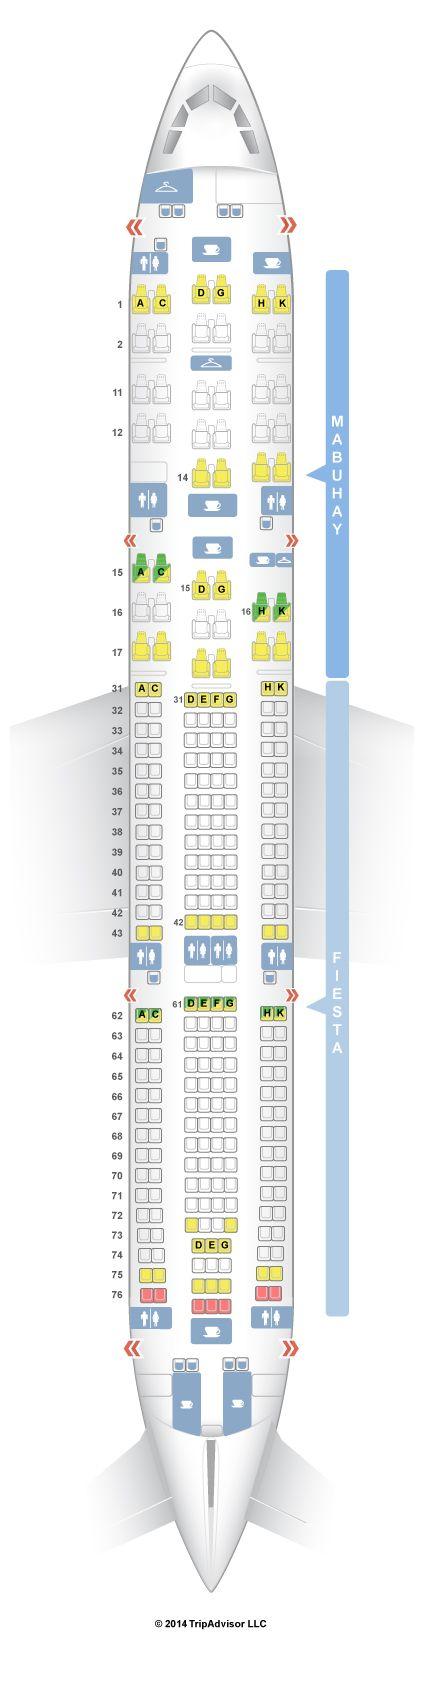 Seatguru Seat Map Philippine Airlines Airbus A340 300 343 V1